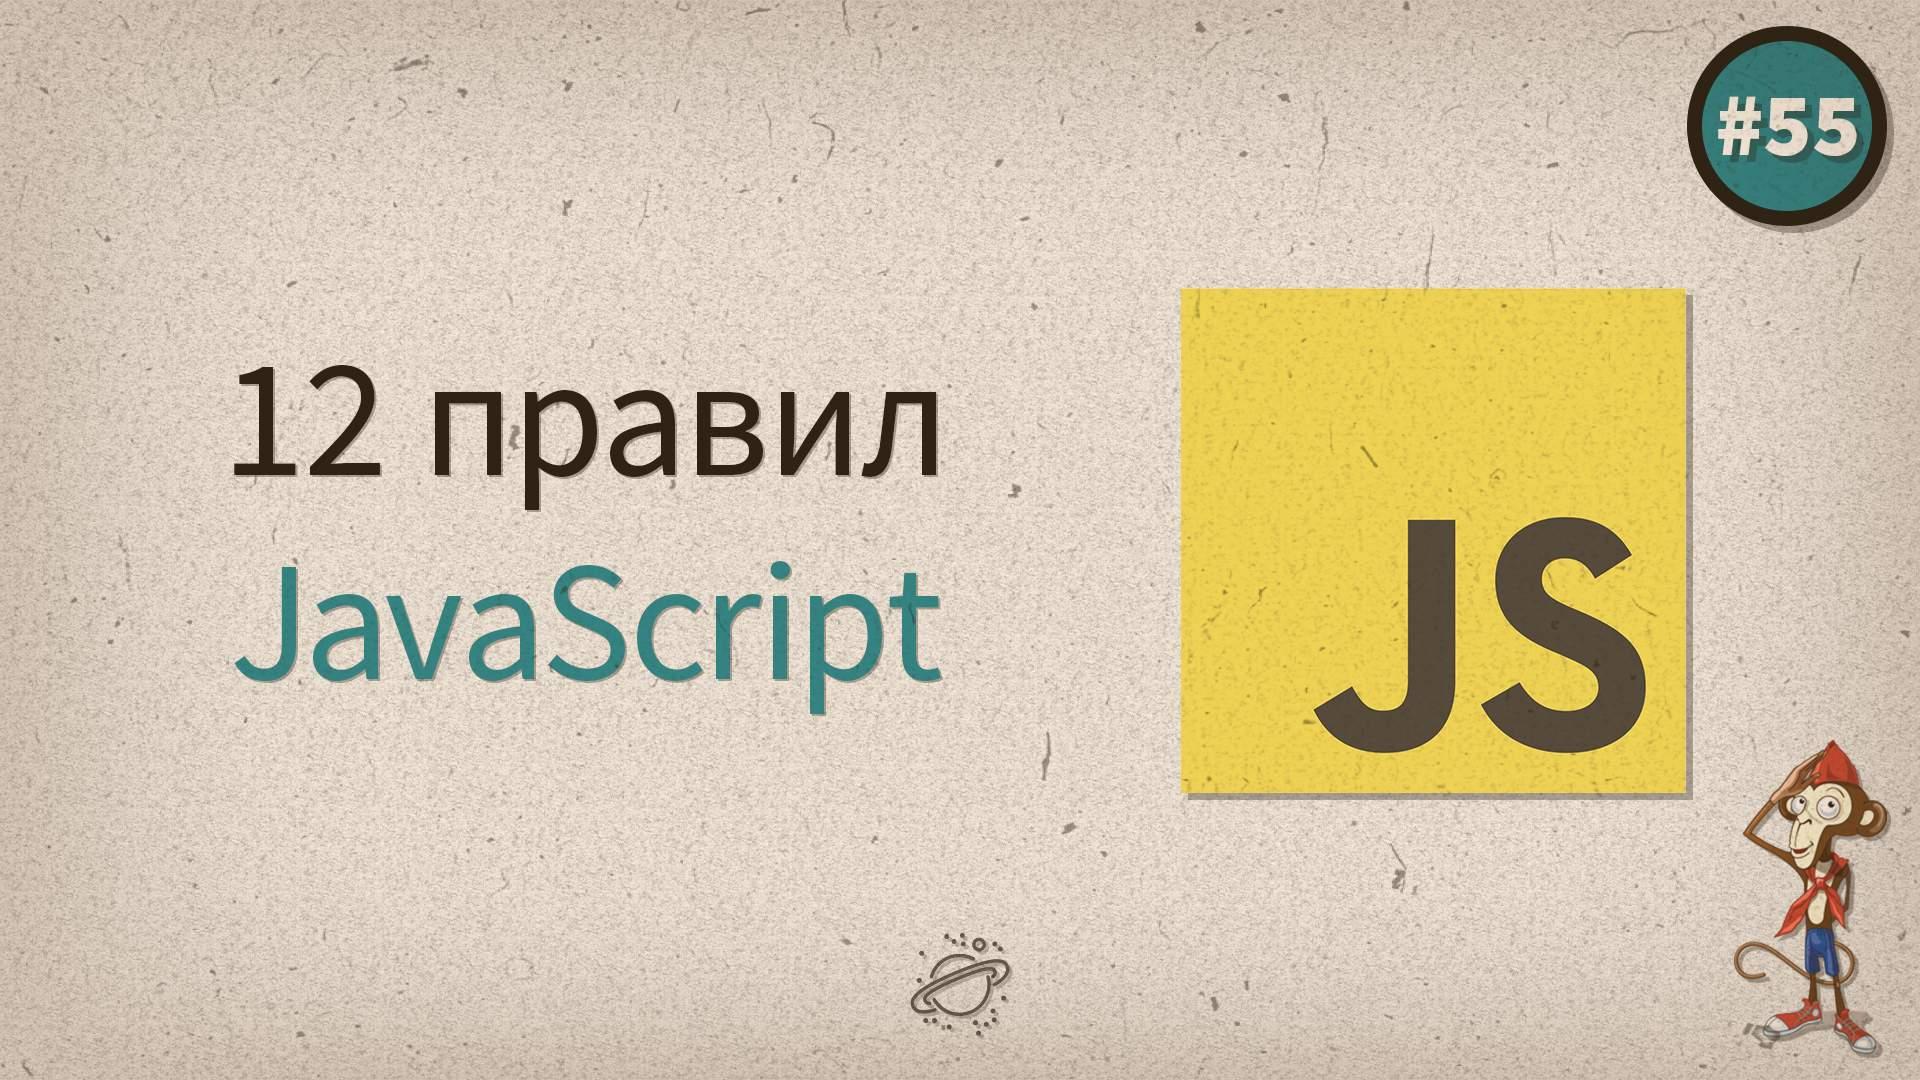 12 правил хорошего JavaScript